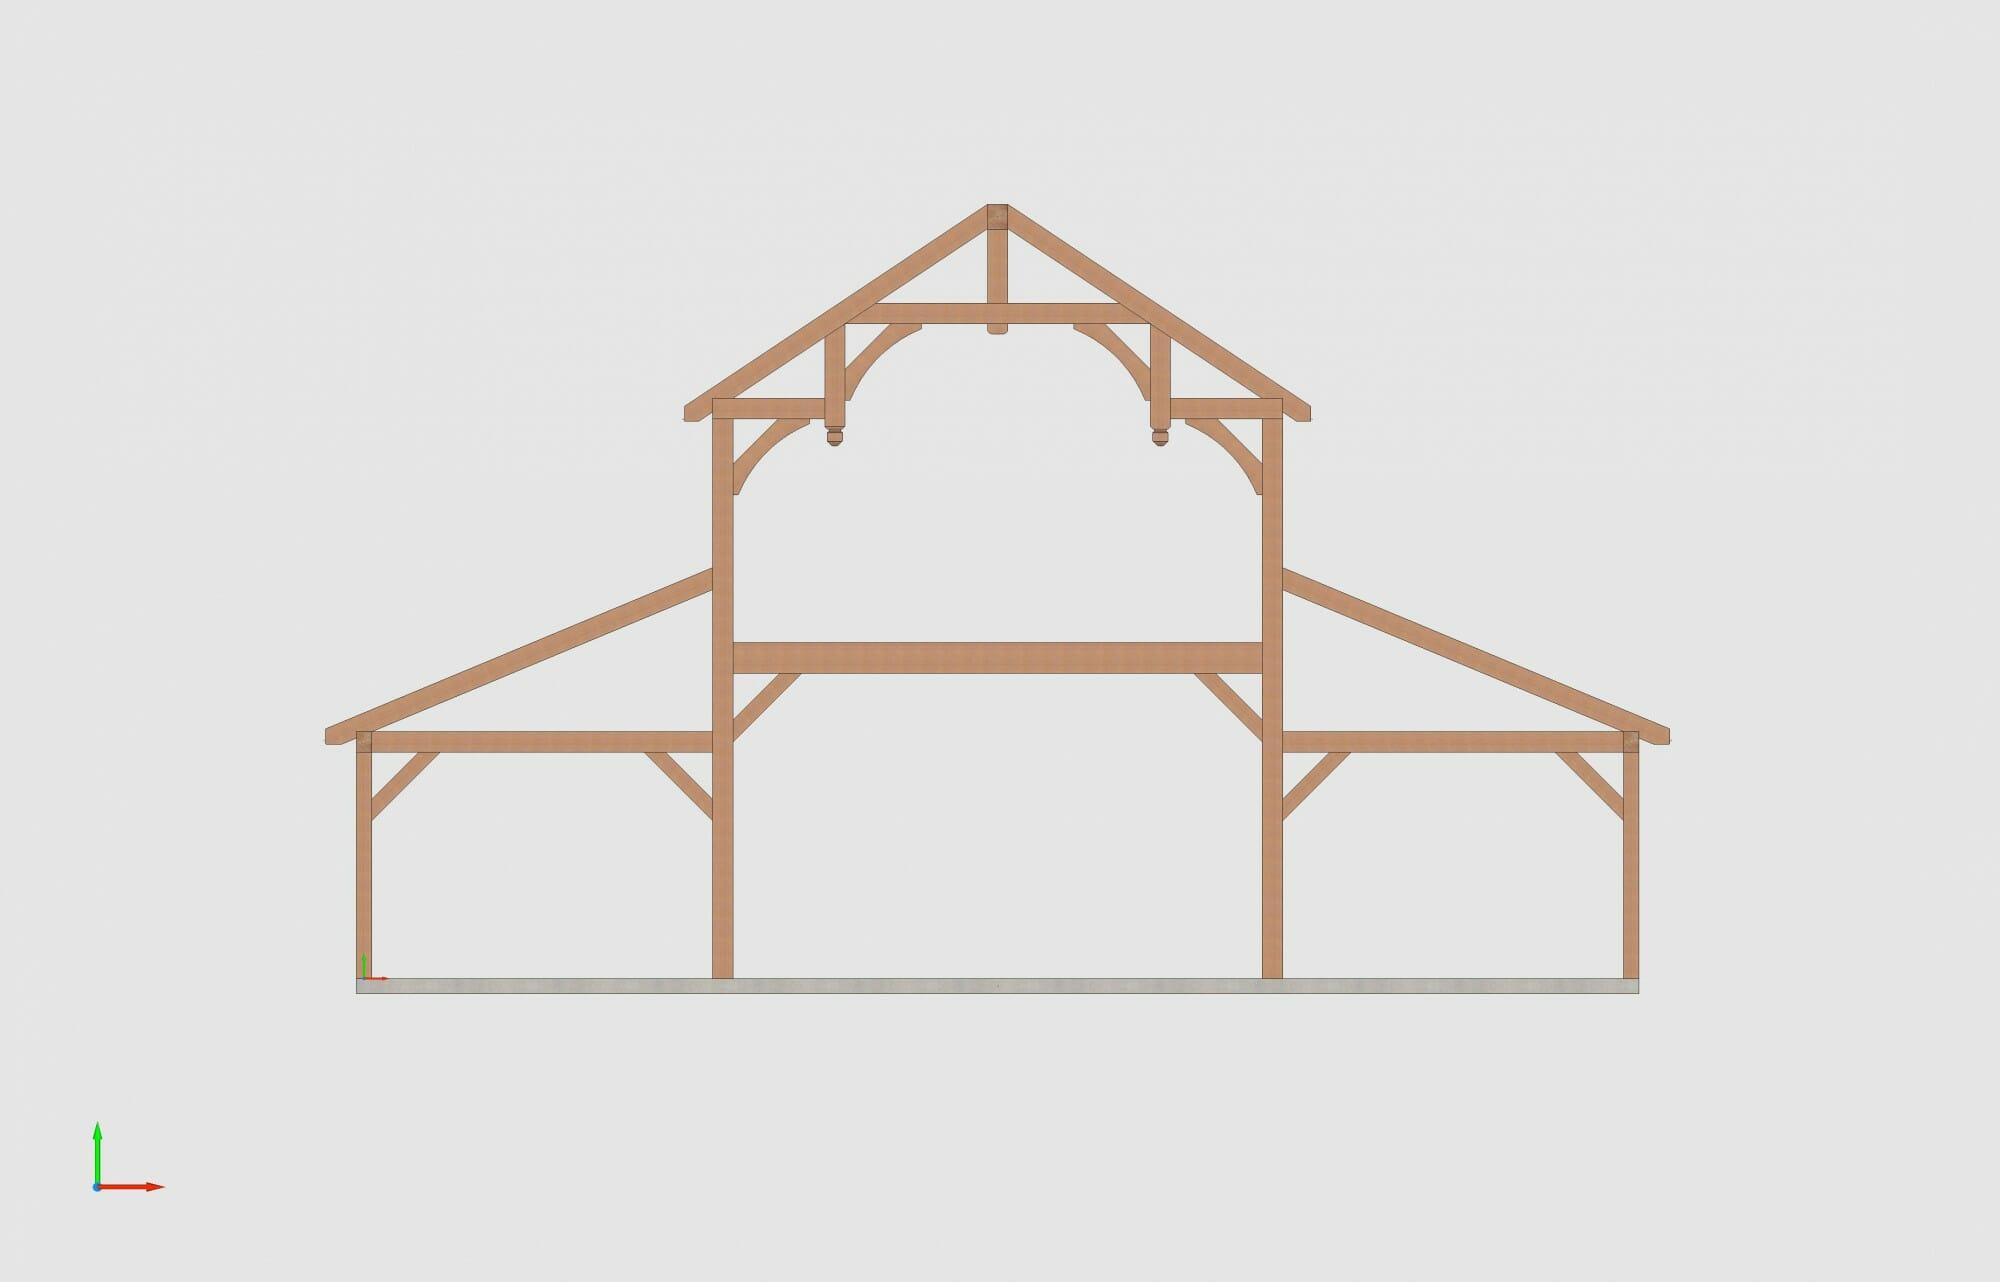 Timber Frame Design of a Fancy Barn